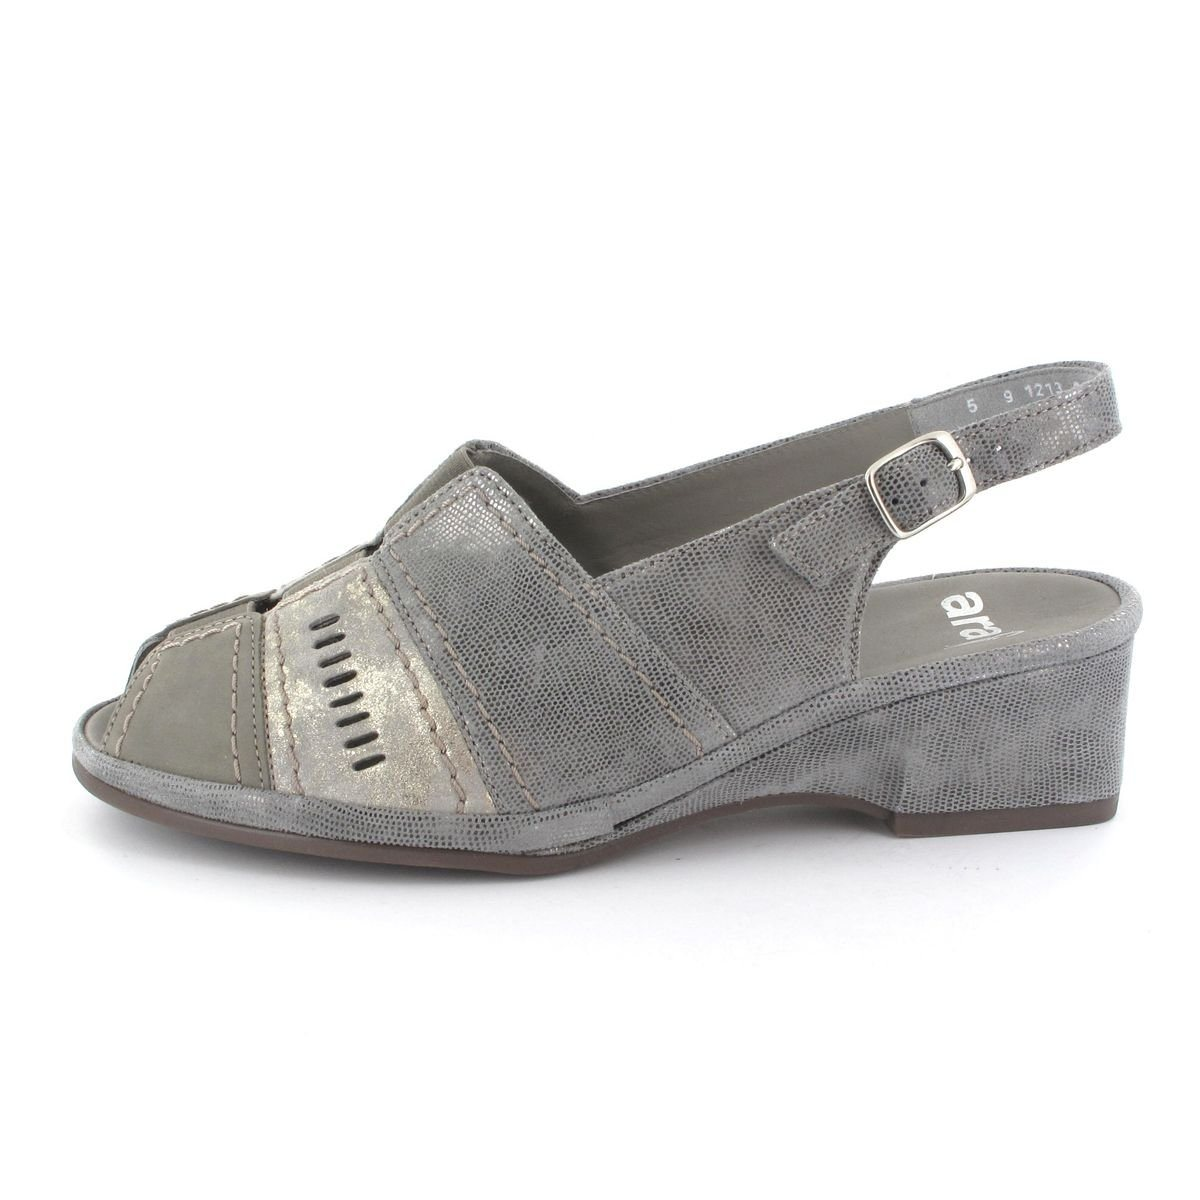 Ara Sandalette | Schuhe > Sandalen & Zehentrenner > Sandalen | Grau | Ara